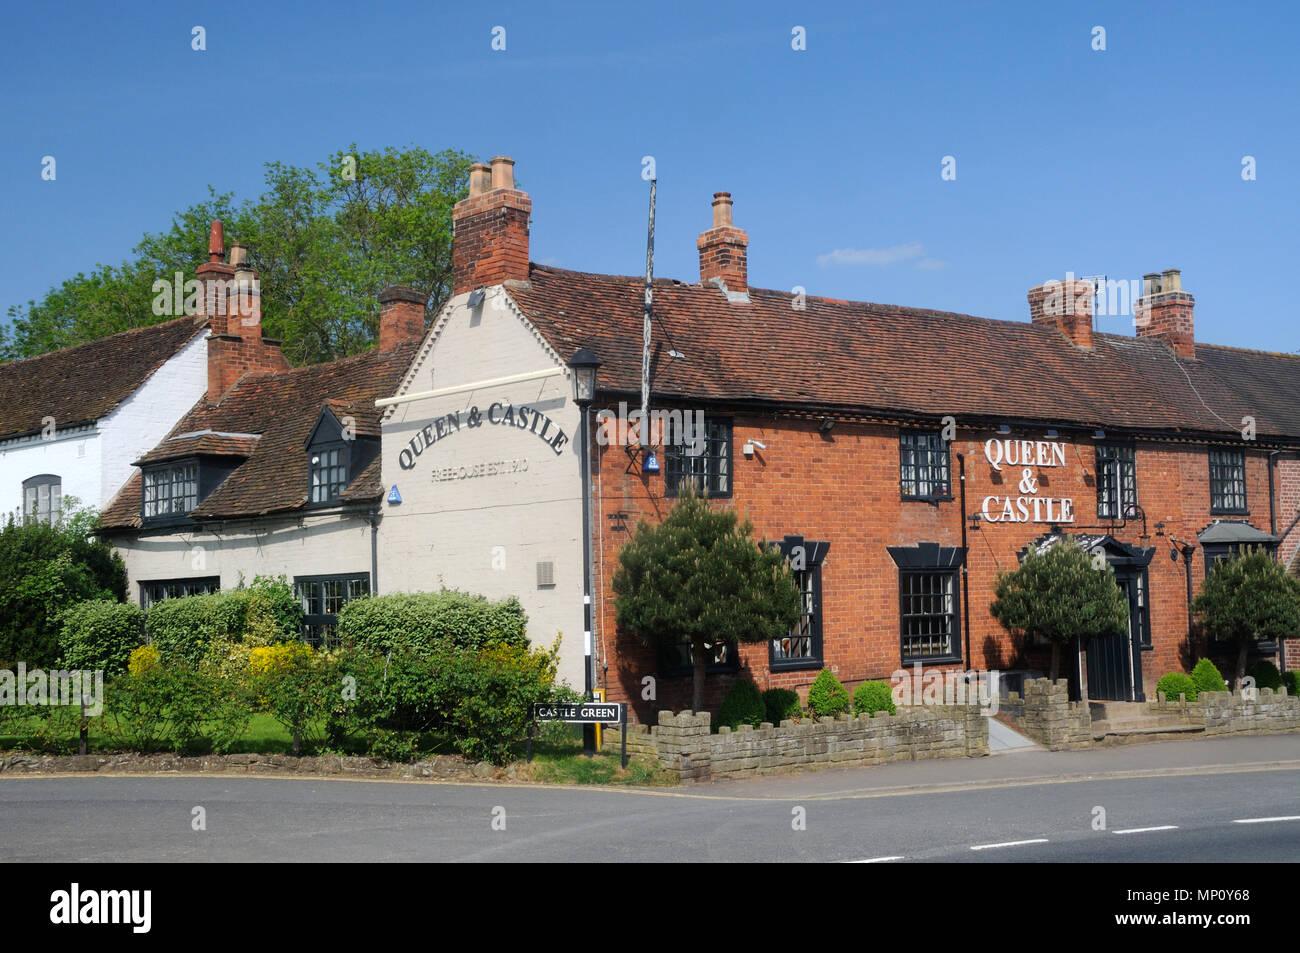 The Queen & Castle, in Kenilworth, Warwickshire, England - Stock Image